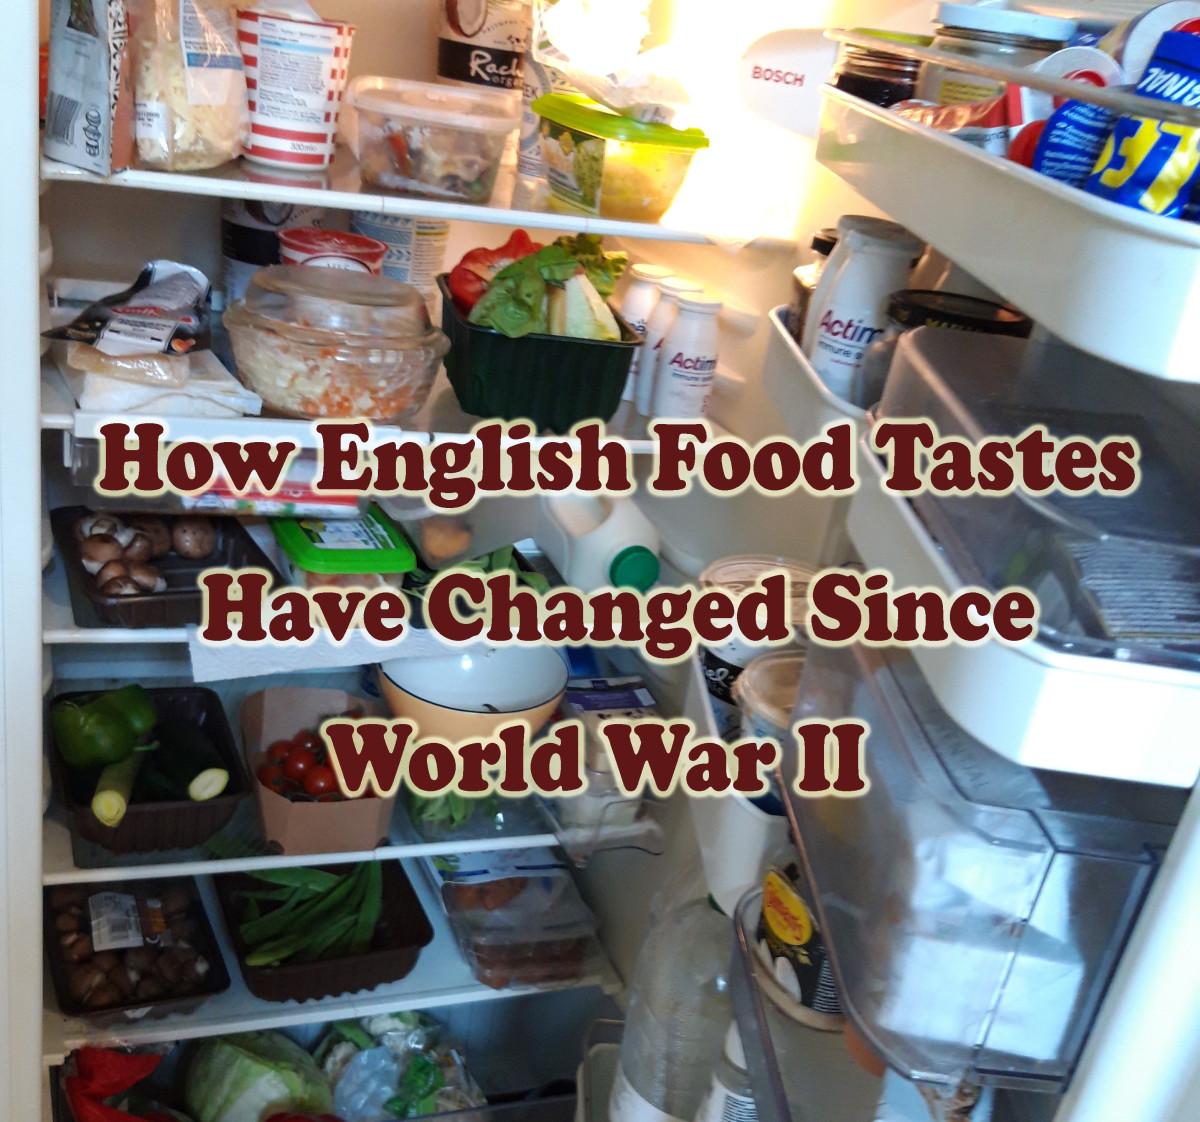 How English Food Tastes Have Changed Since World War II